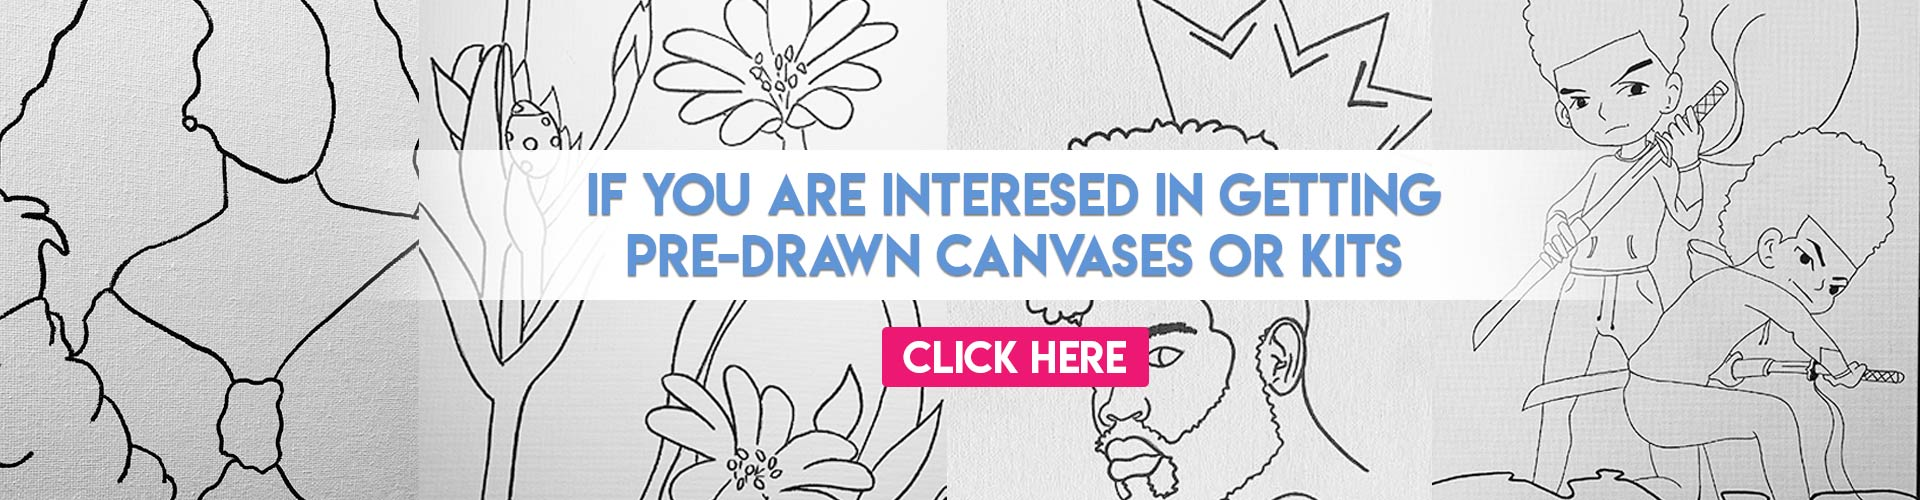 DragunfliDesignz Pre-Drawn Canvas Kits